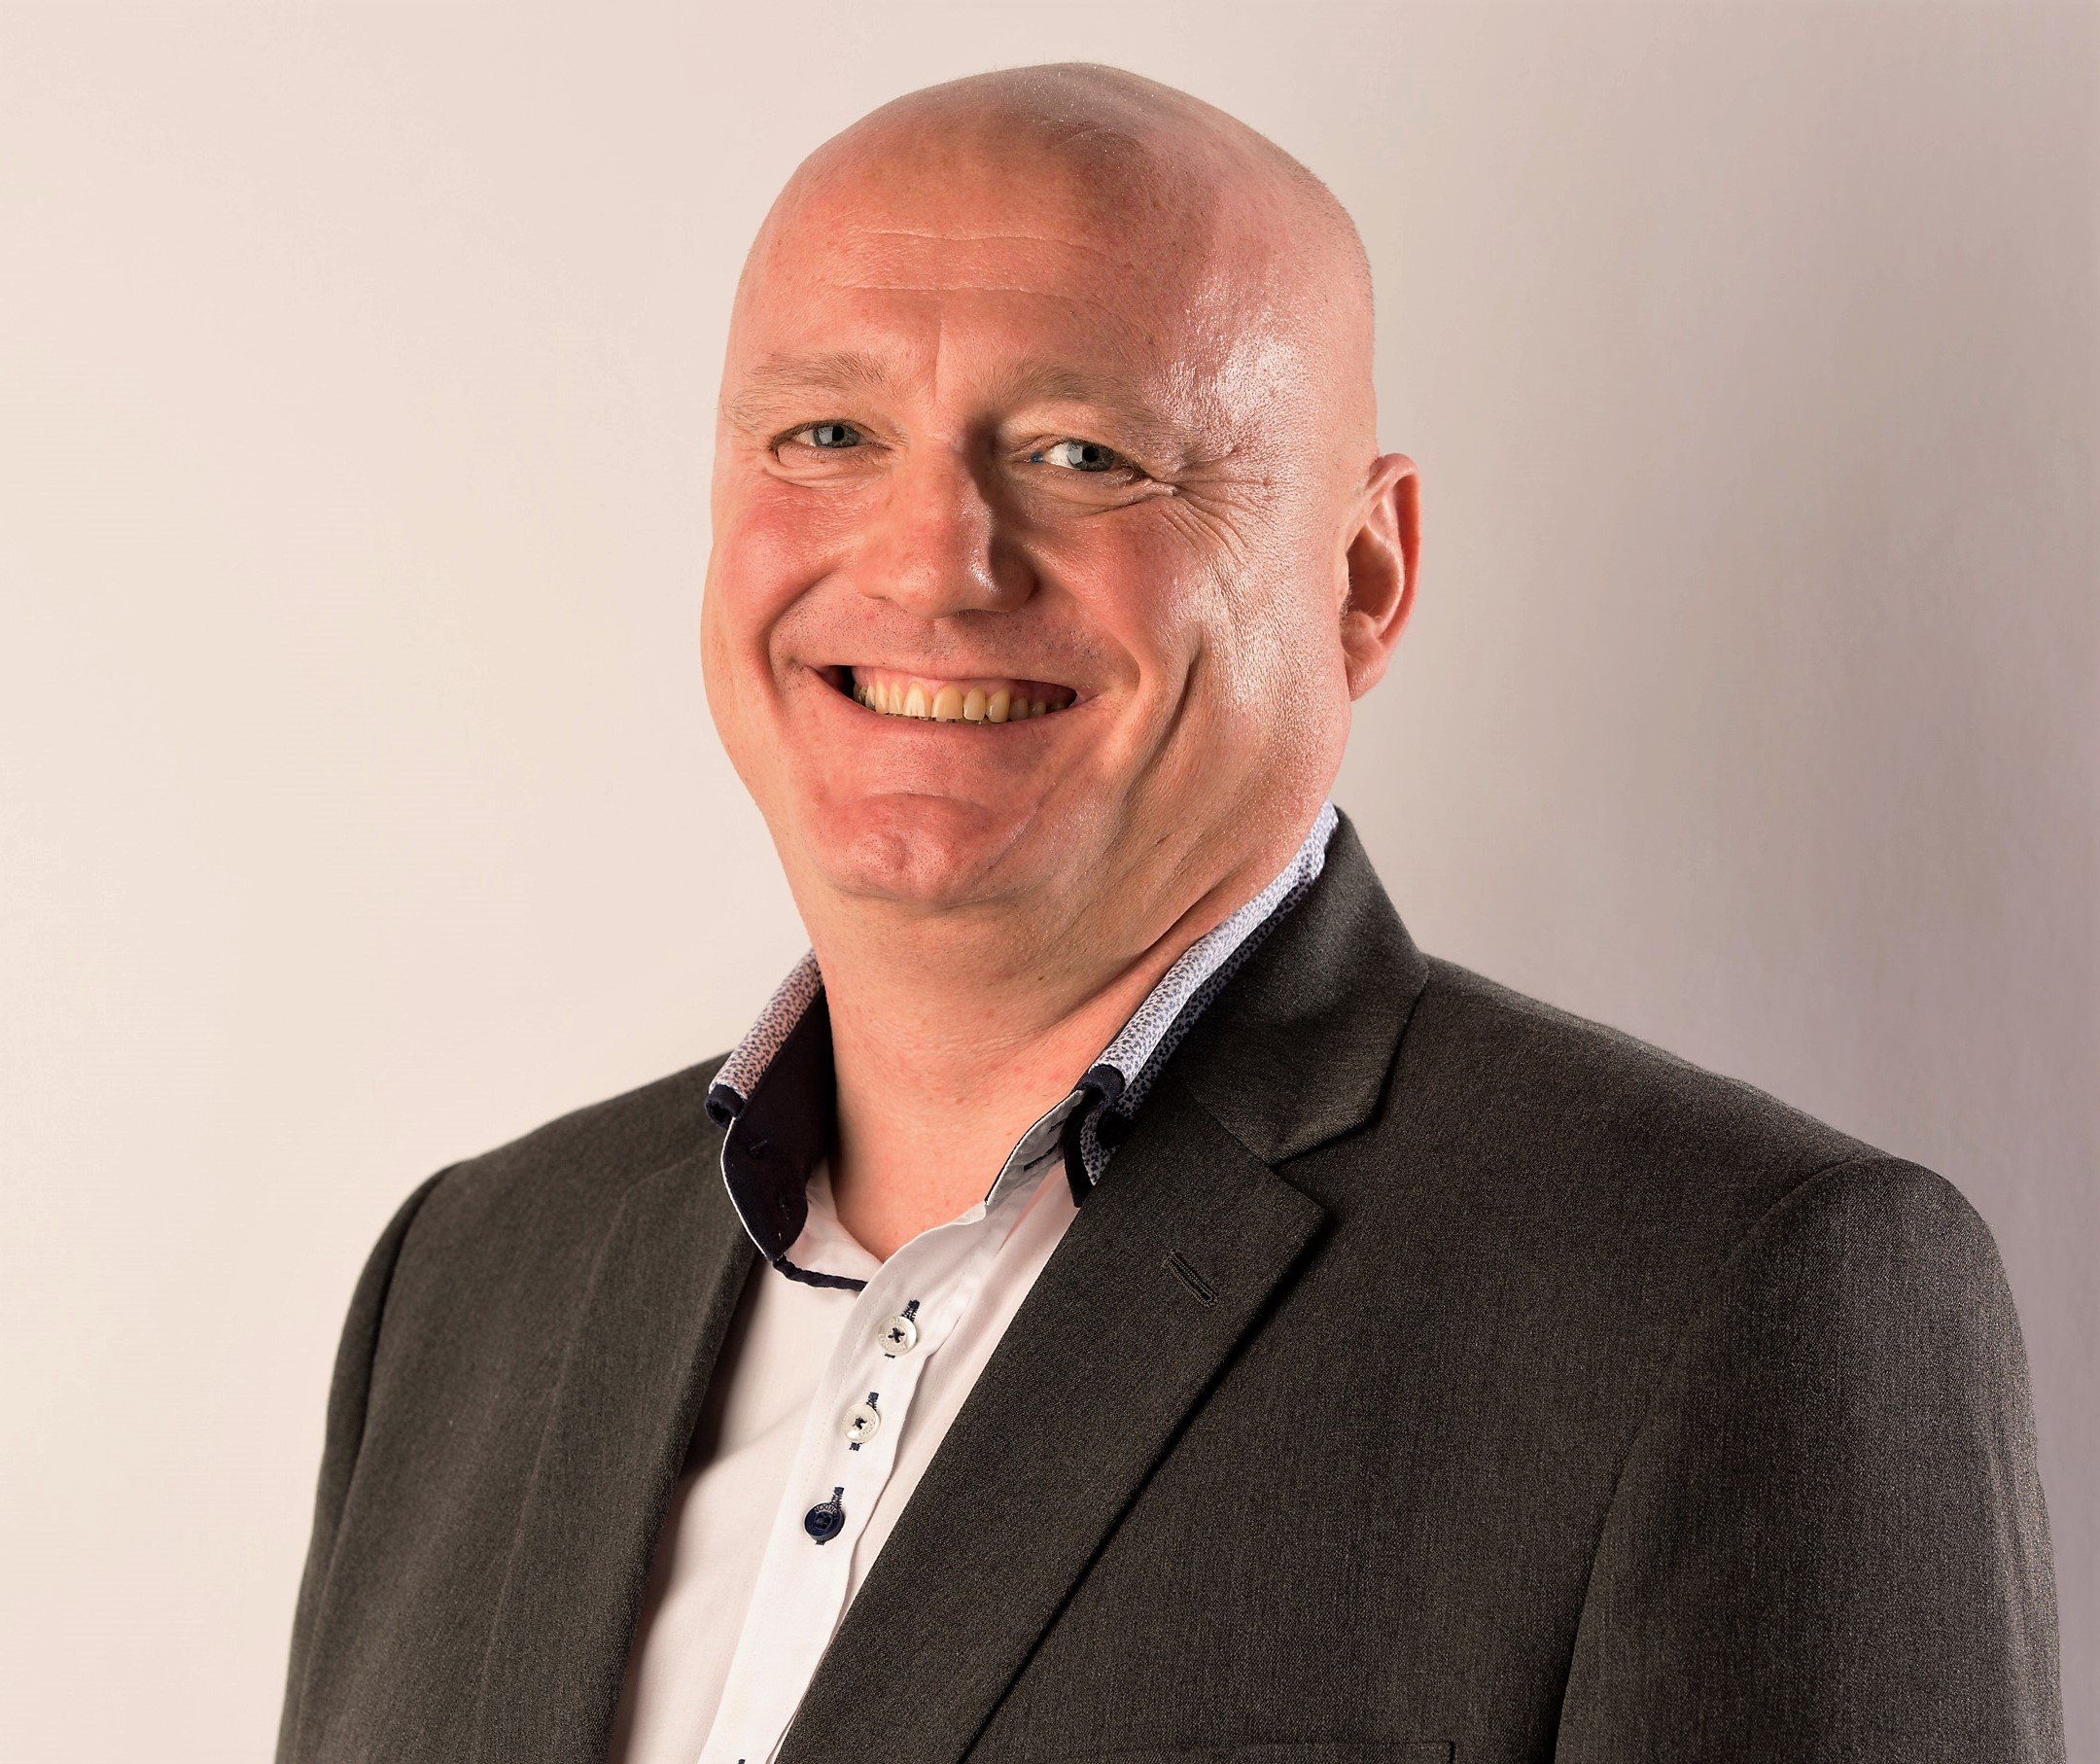 Marcus Thomlinson - Founder